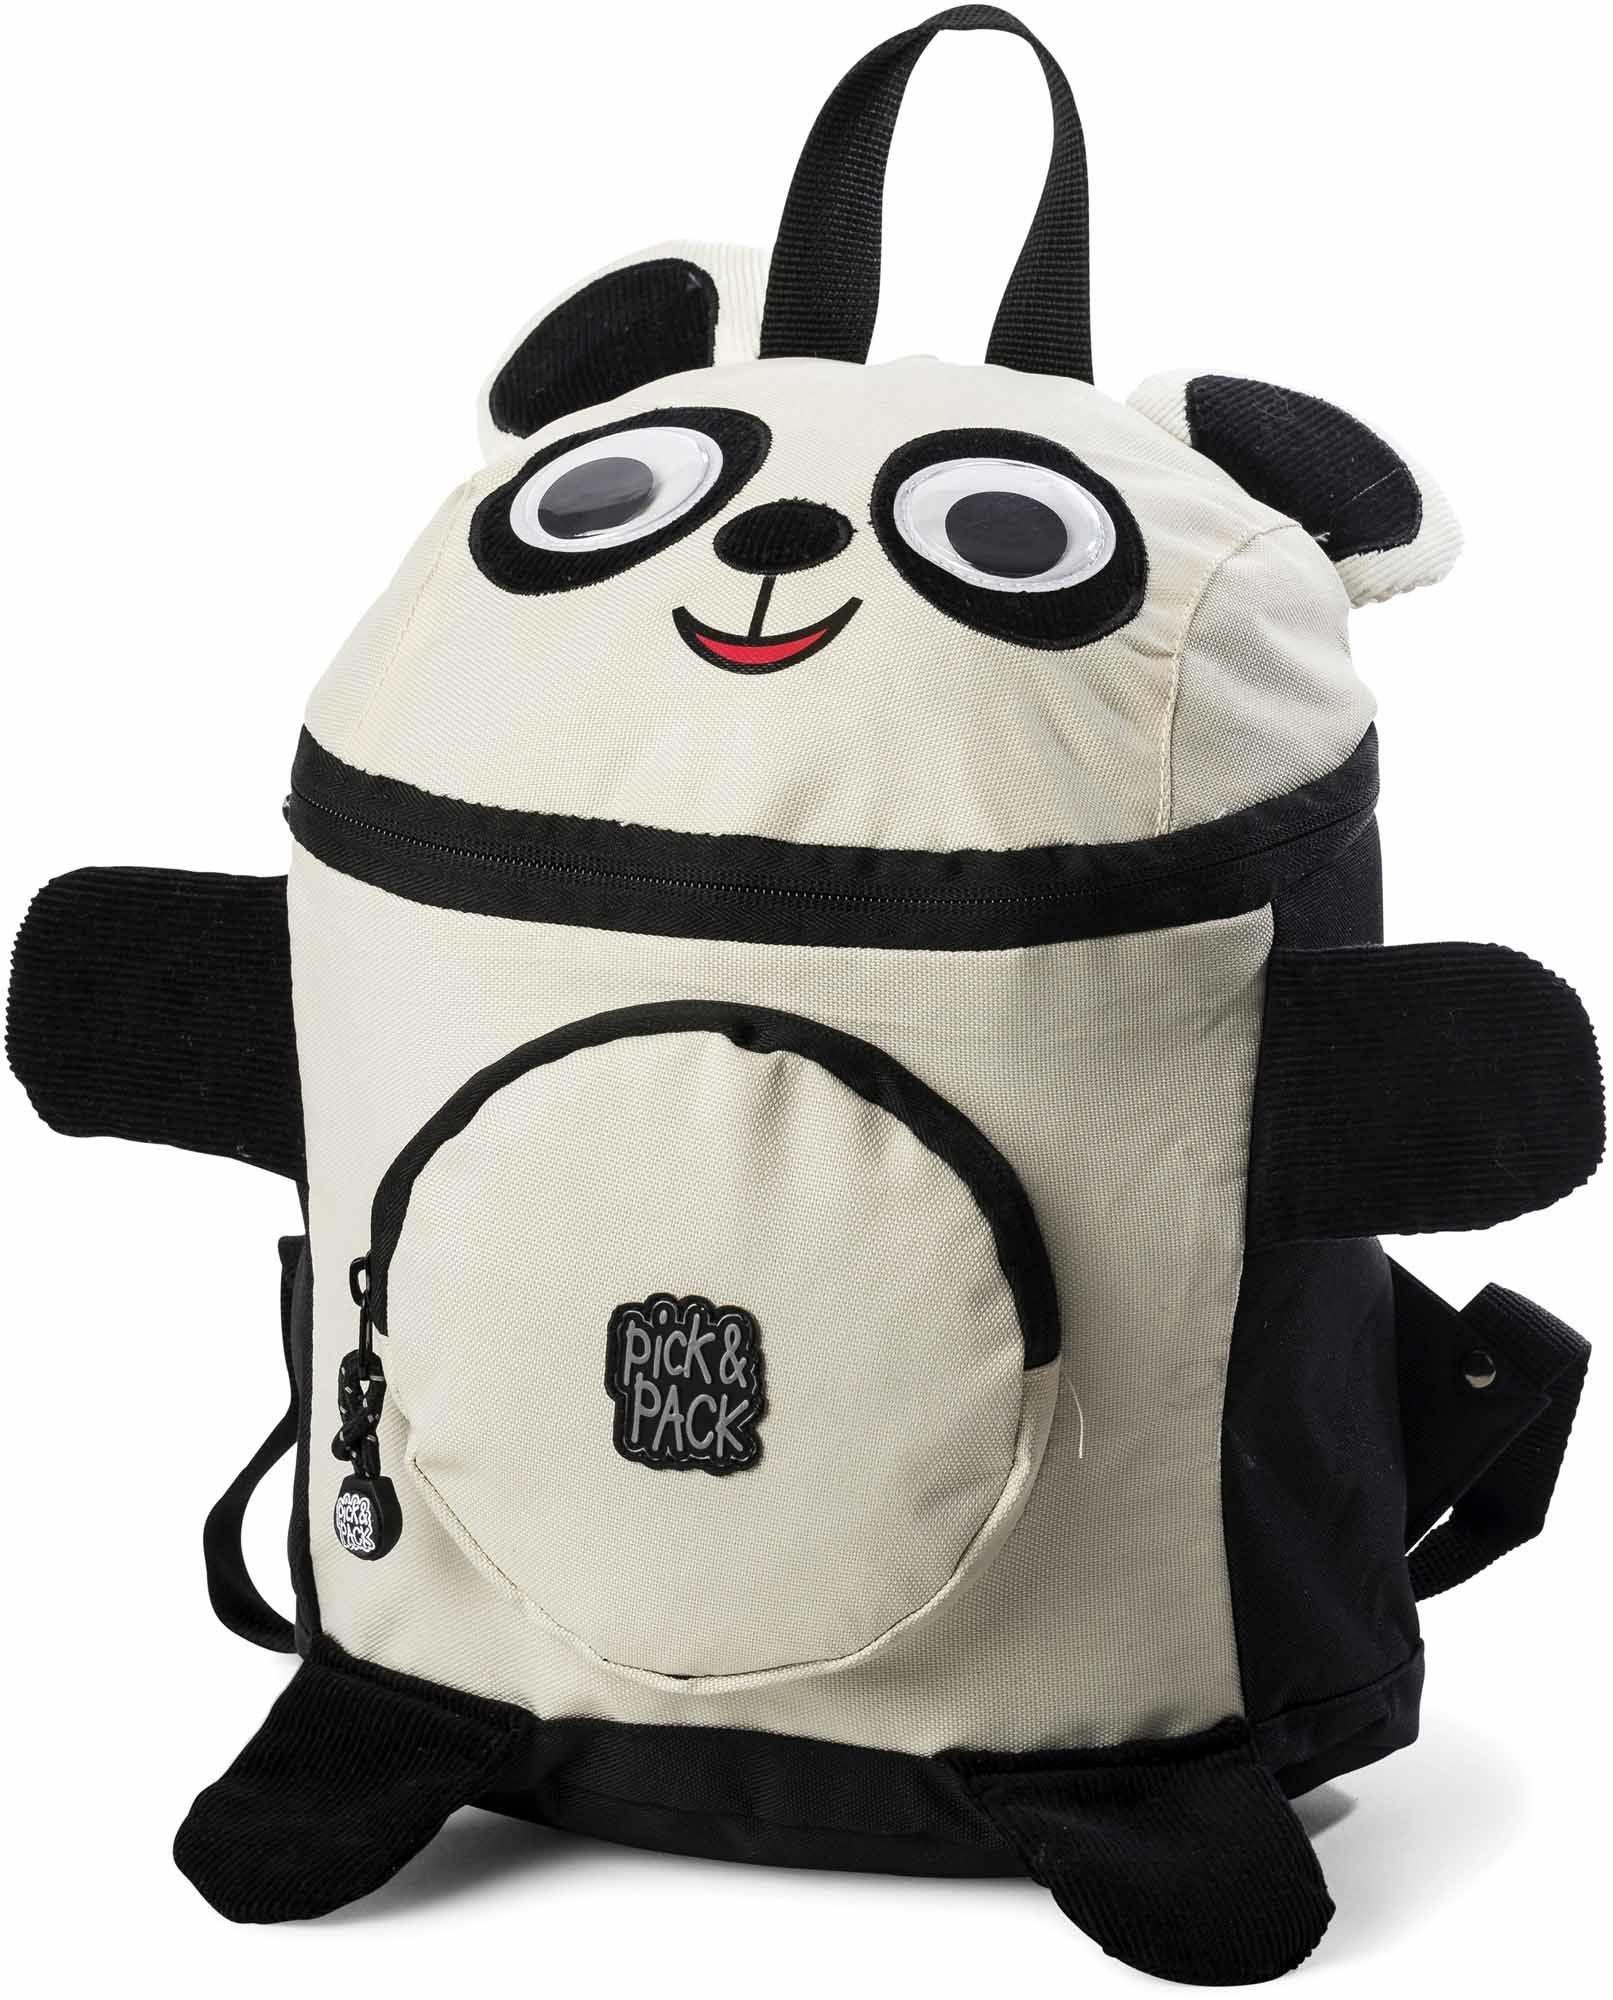 Pick & Pack Ryggsäck Panda, Black